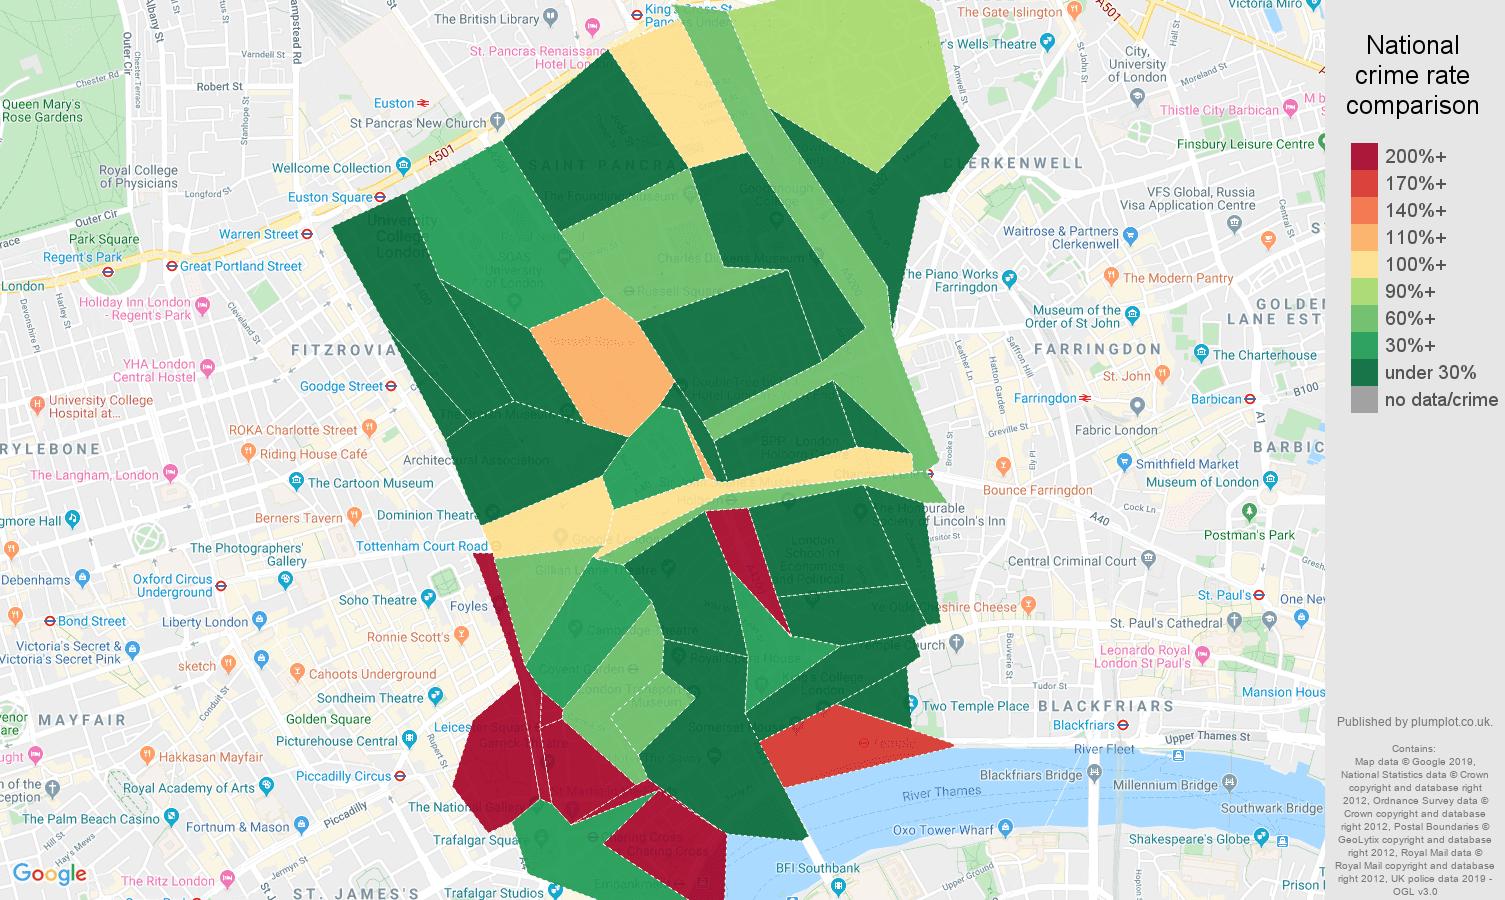 Western Central London public order crime rate comparison map